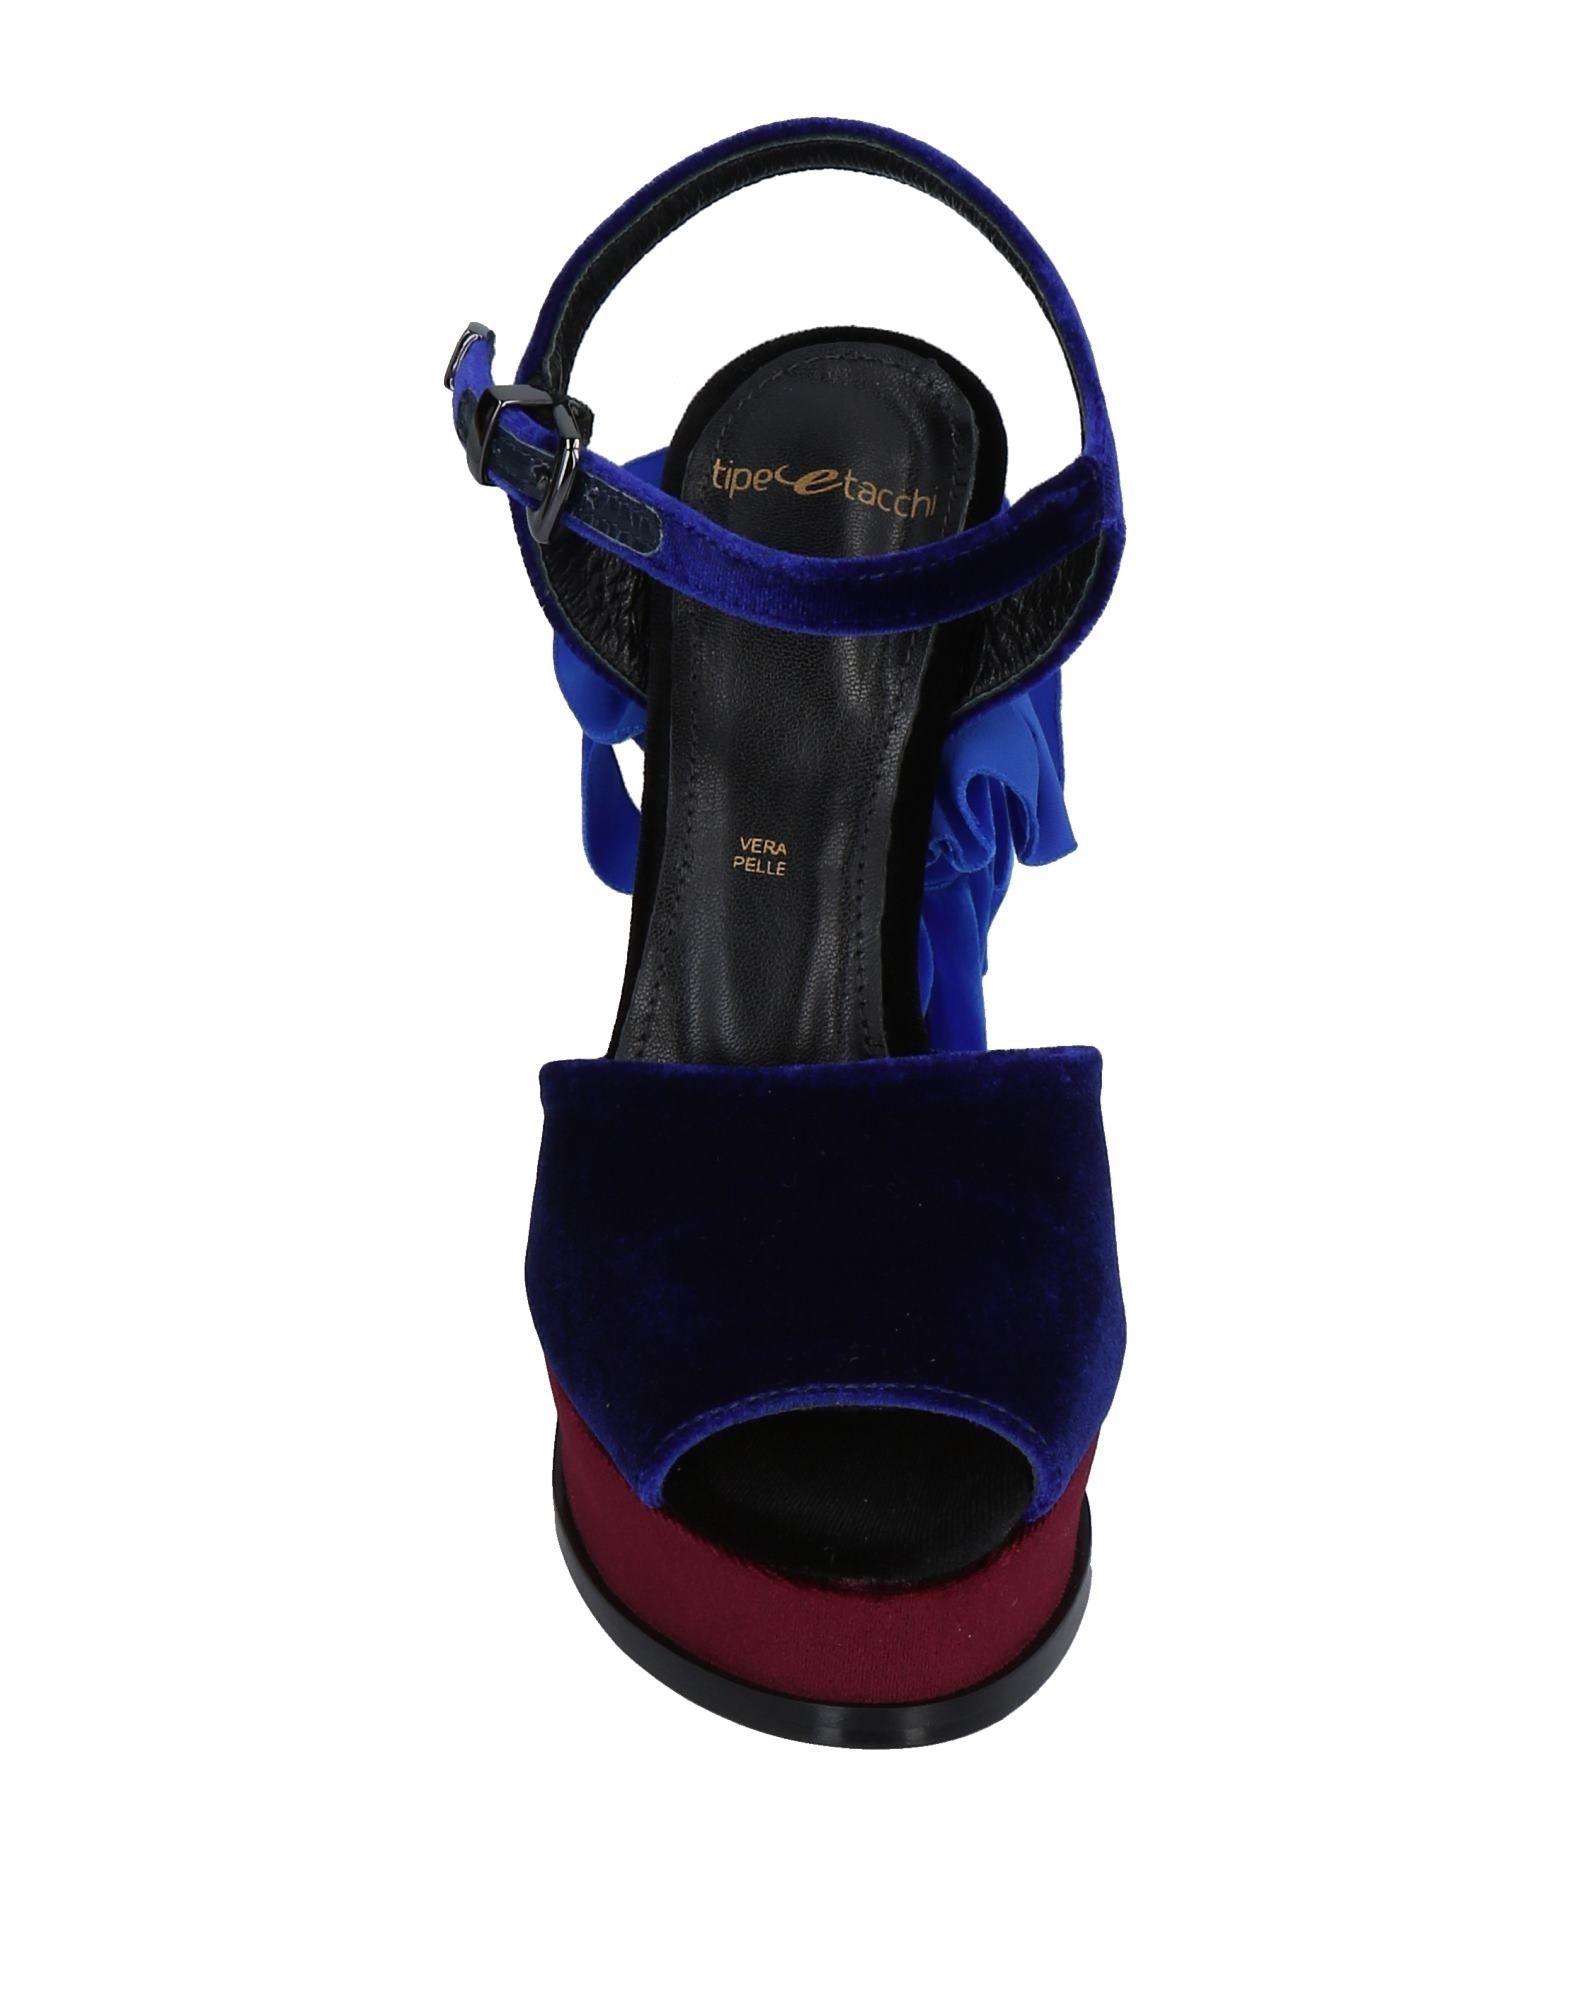 Tipe E Tacchi Sandalen beliebte Damen 11483492NX Gute Qualität beliebte Sandalen Schuhe 2f4186